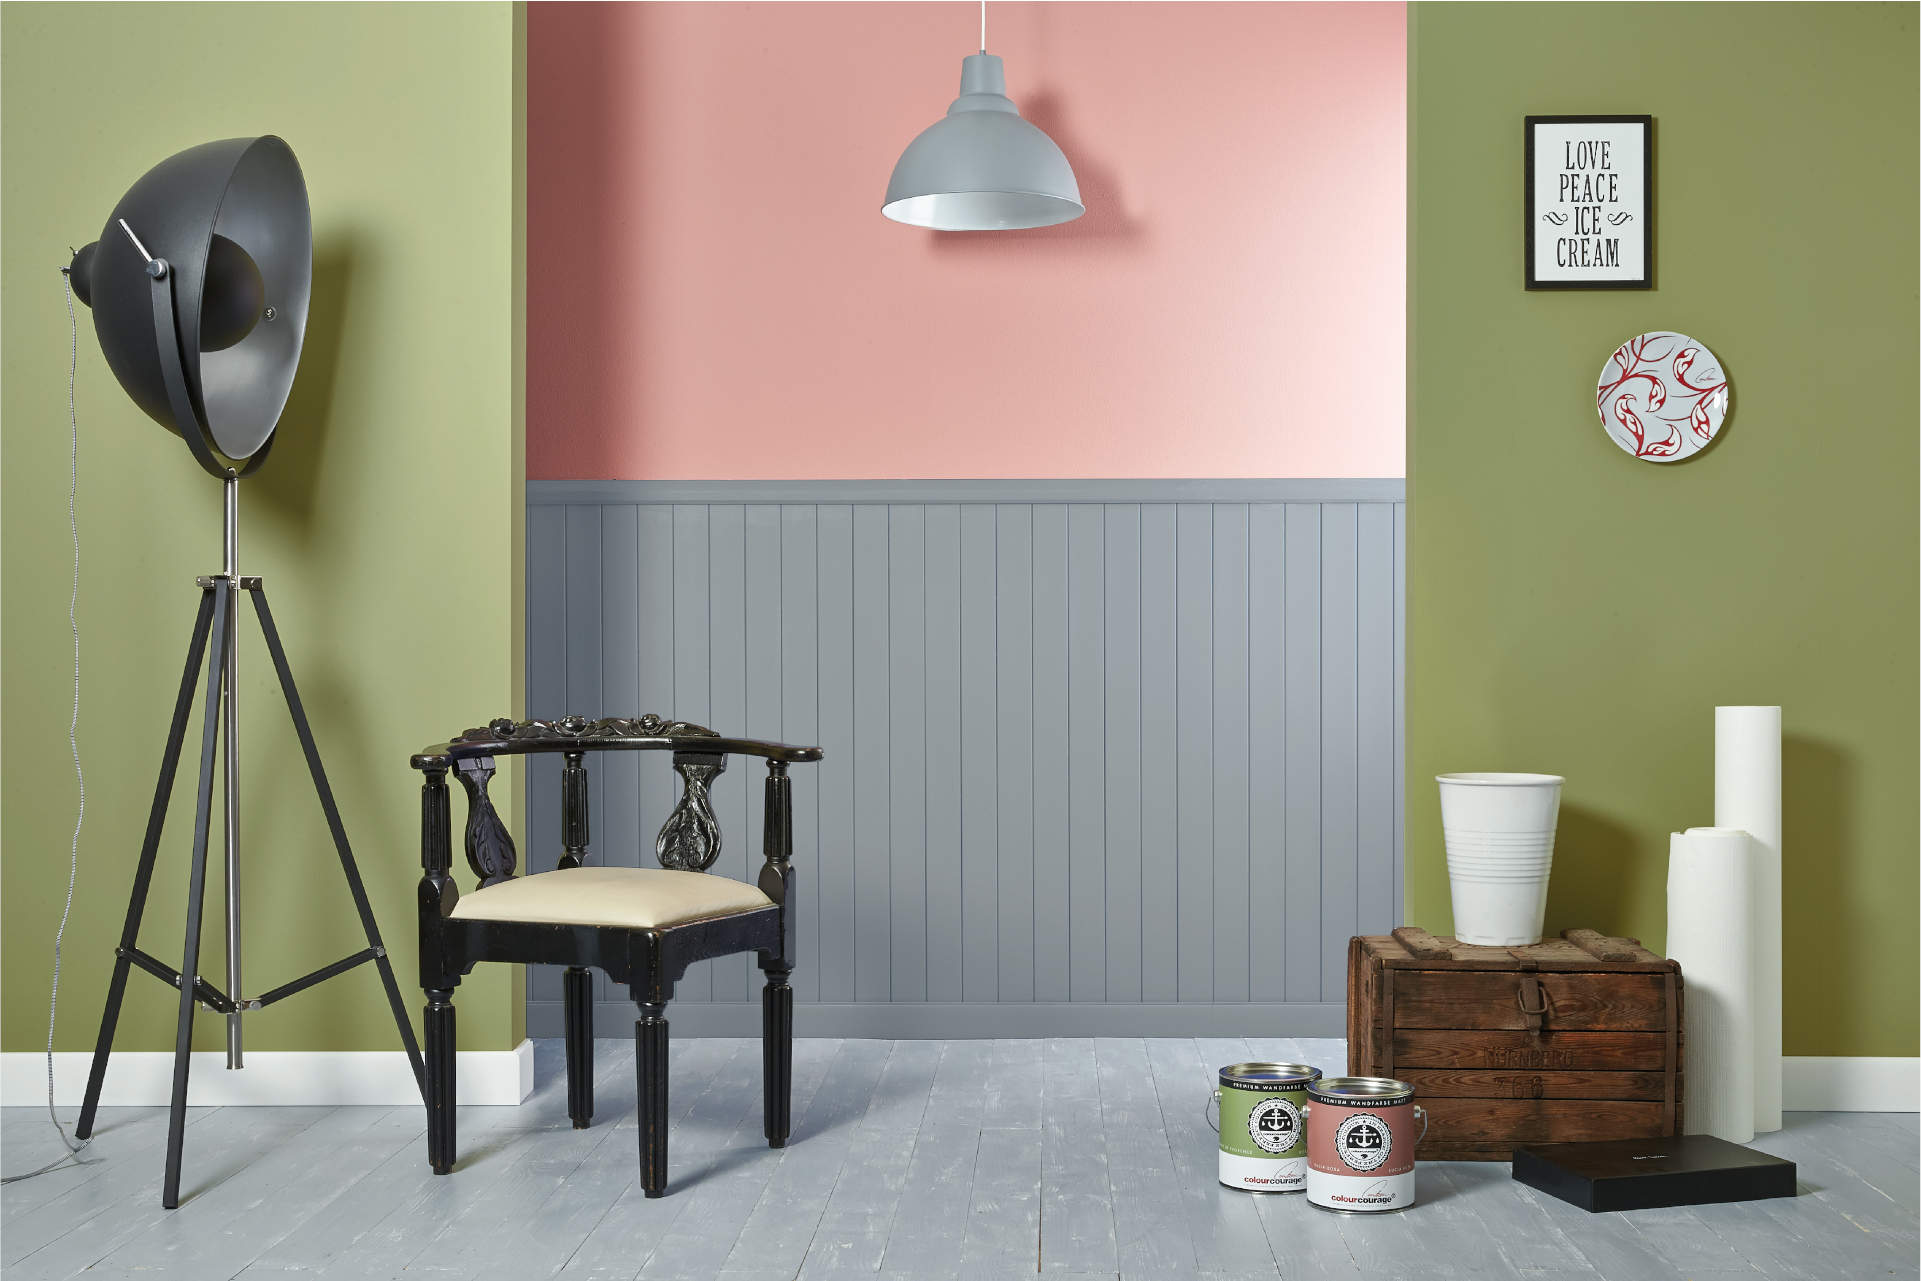 Full Size of Wandfarbe Rosa Colourcourage Premium Matt Sucia Küche Wohnzimmer Wandfarbe Rosa